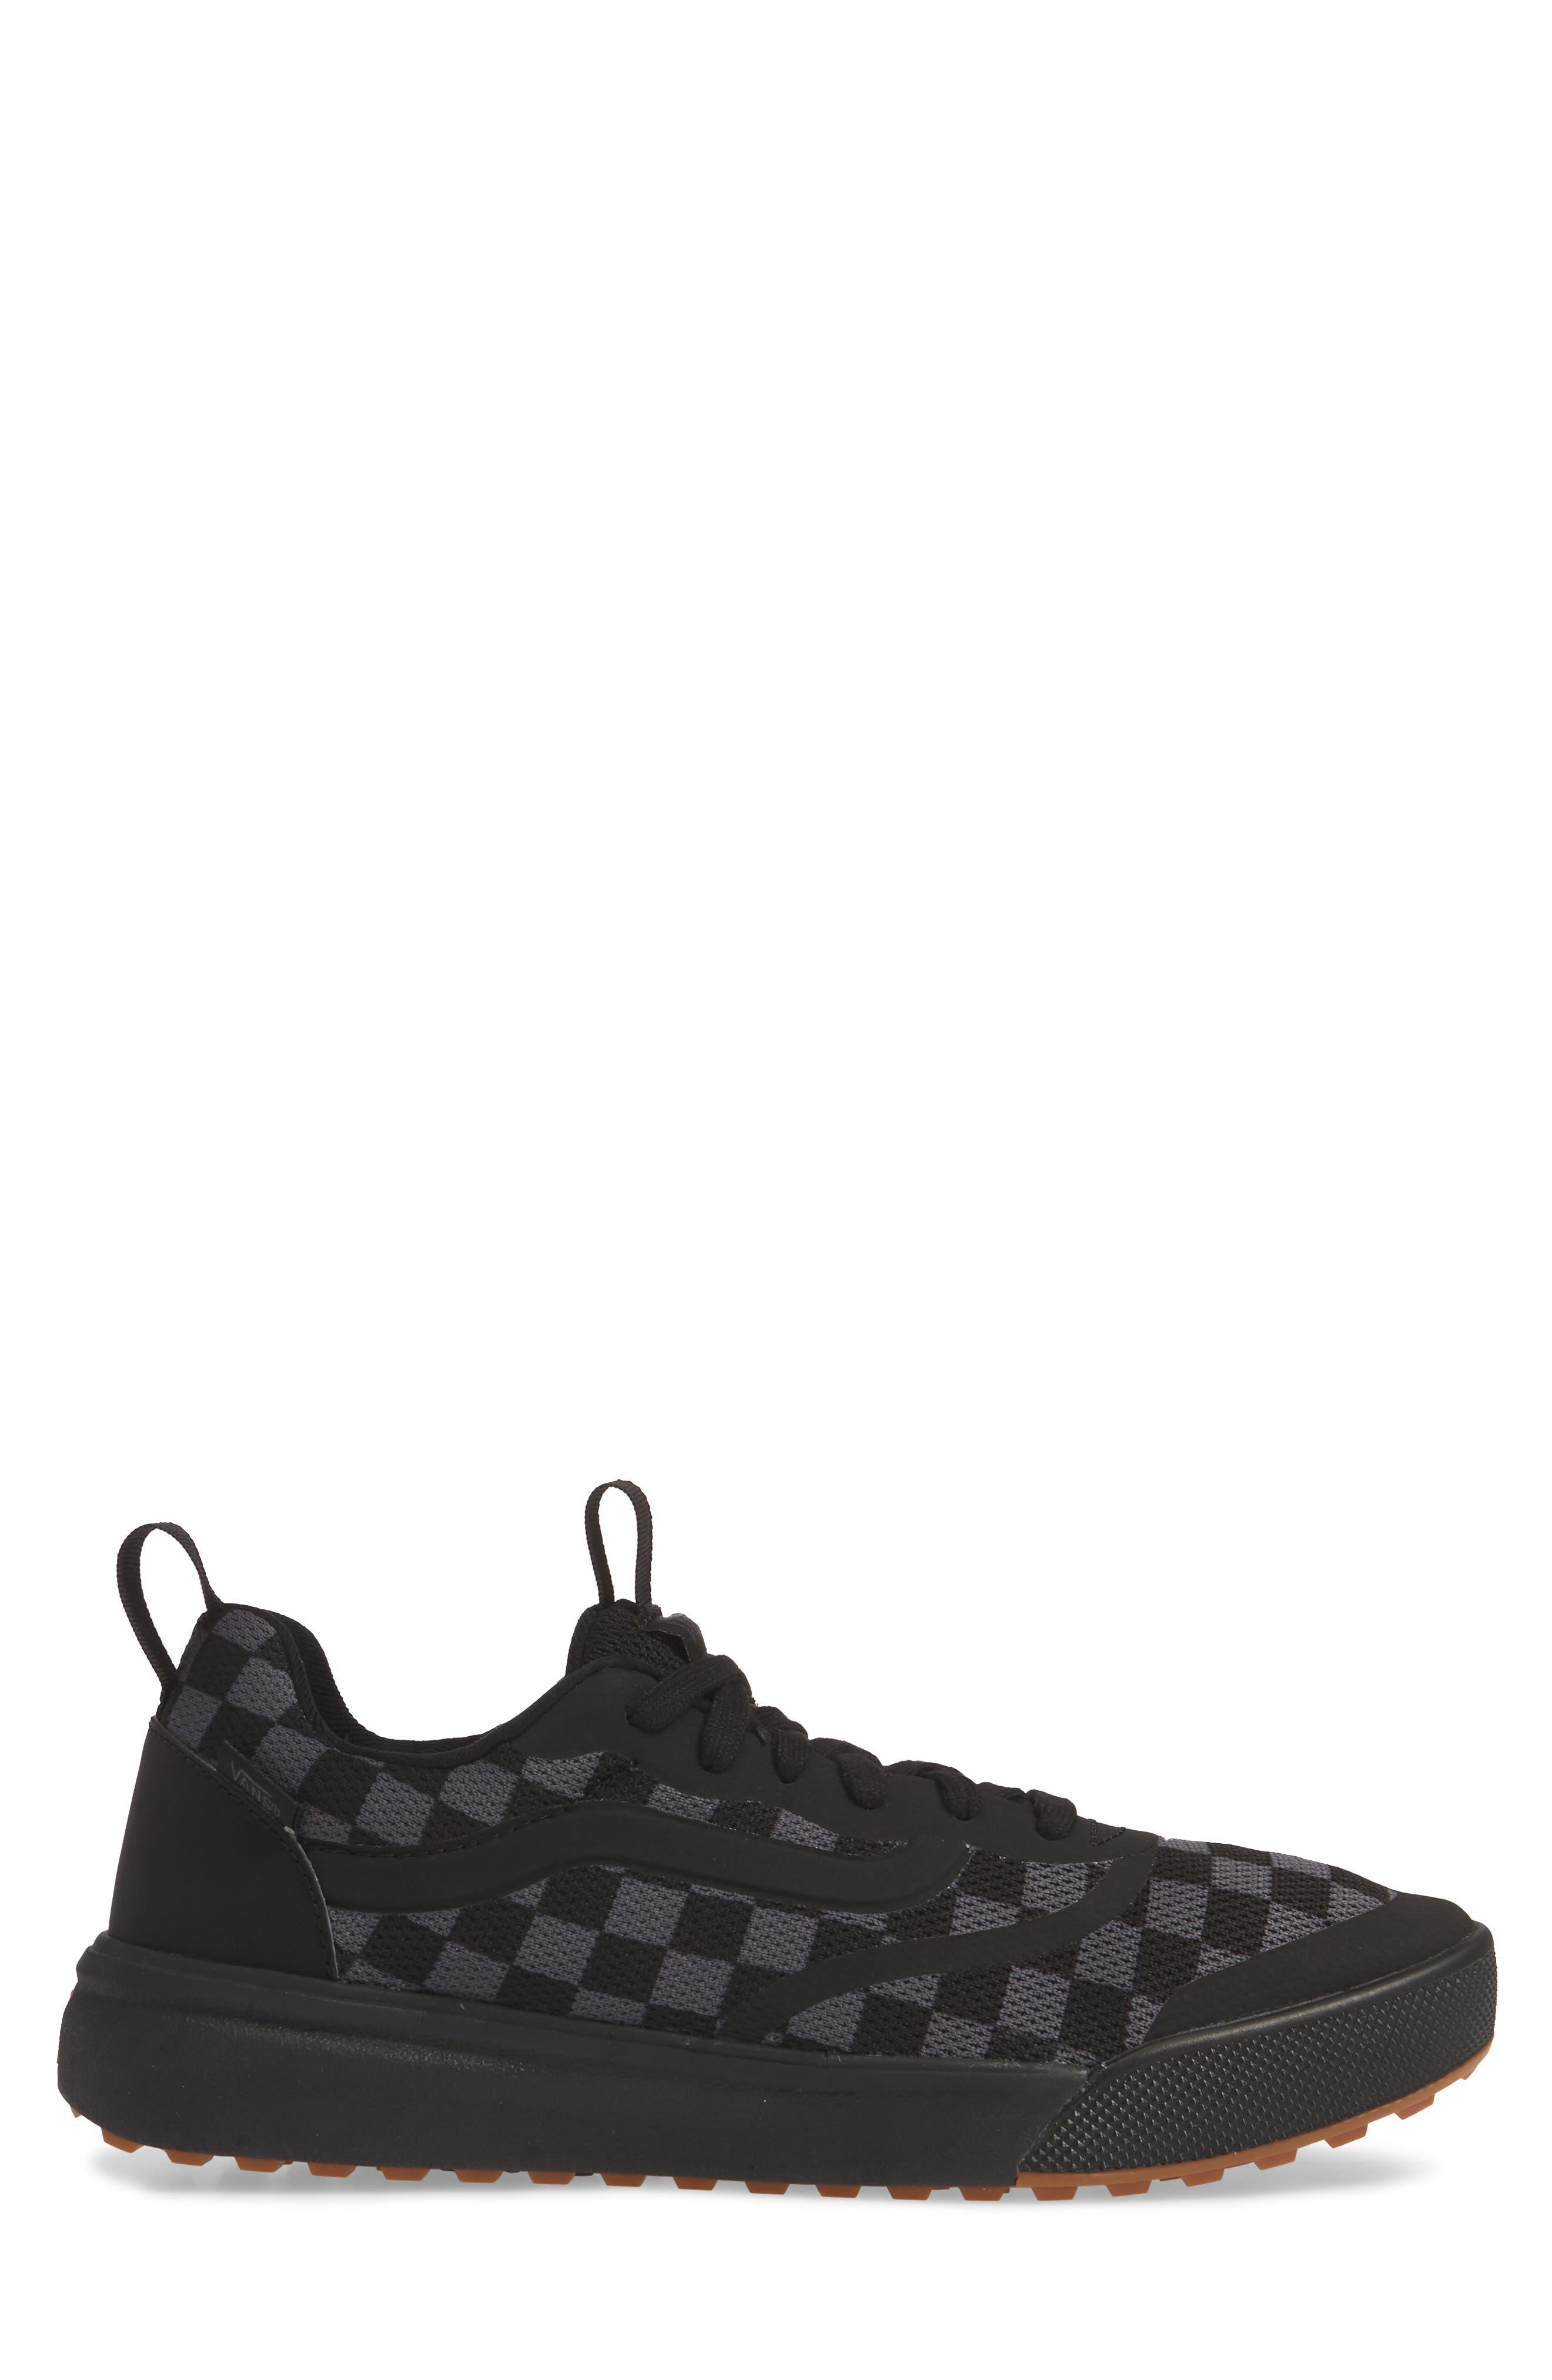 VANS,                             UltraRange Rapidwield Sneaker,                             Alternate thumbnail 3, color,                             003